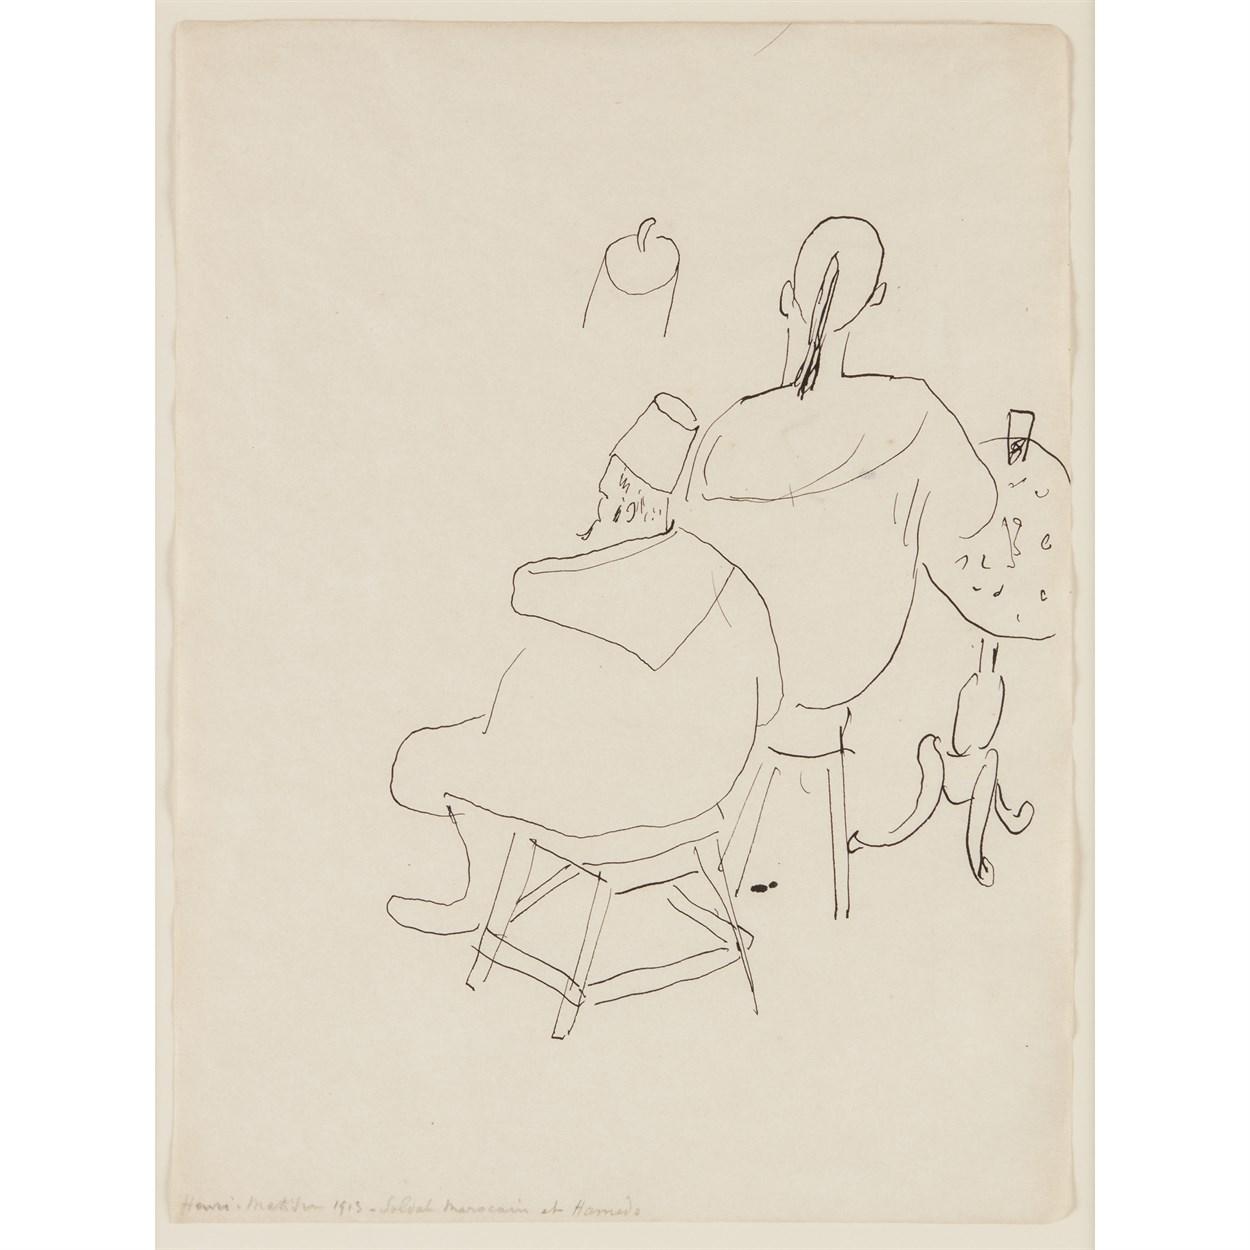 Lot 2 - Henri Matisse (French, 1869-1954)